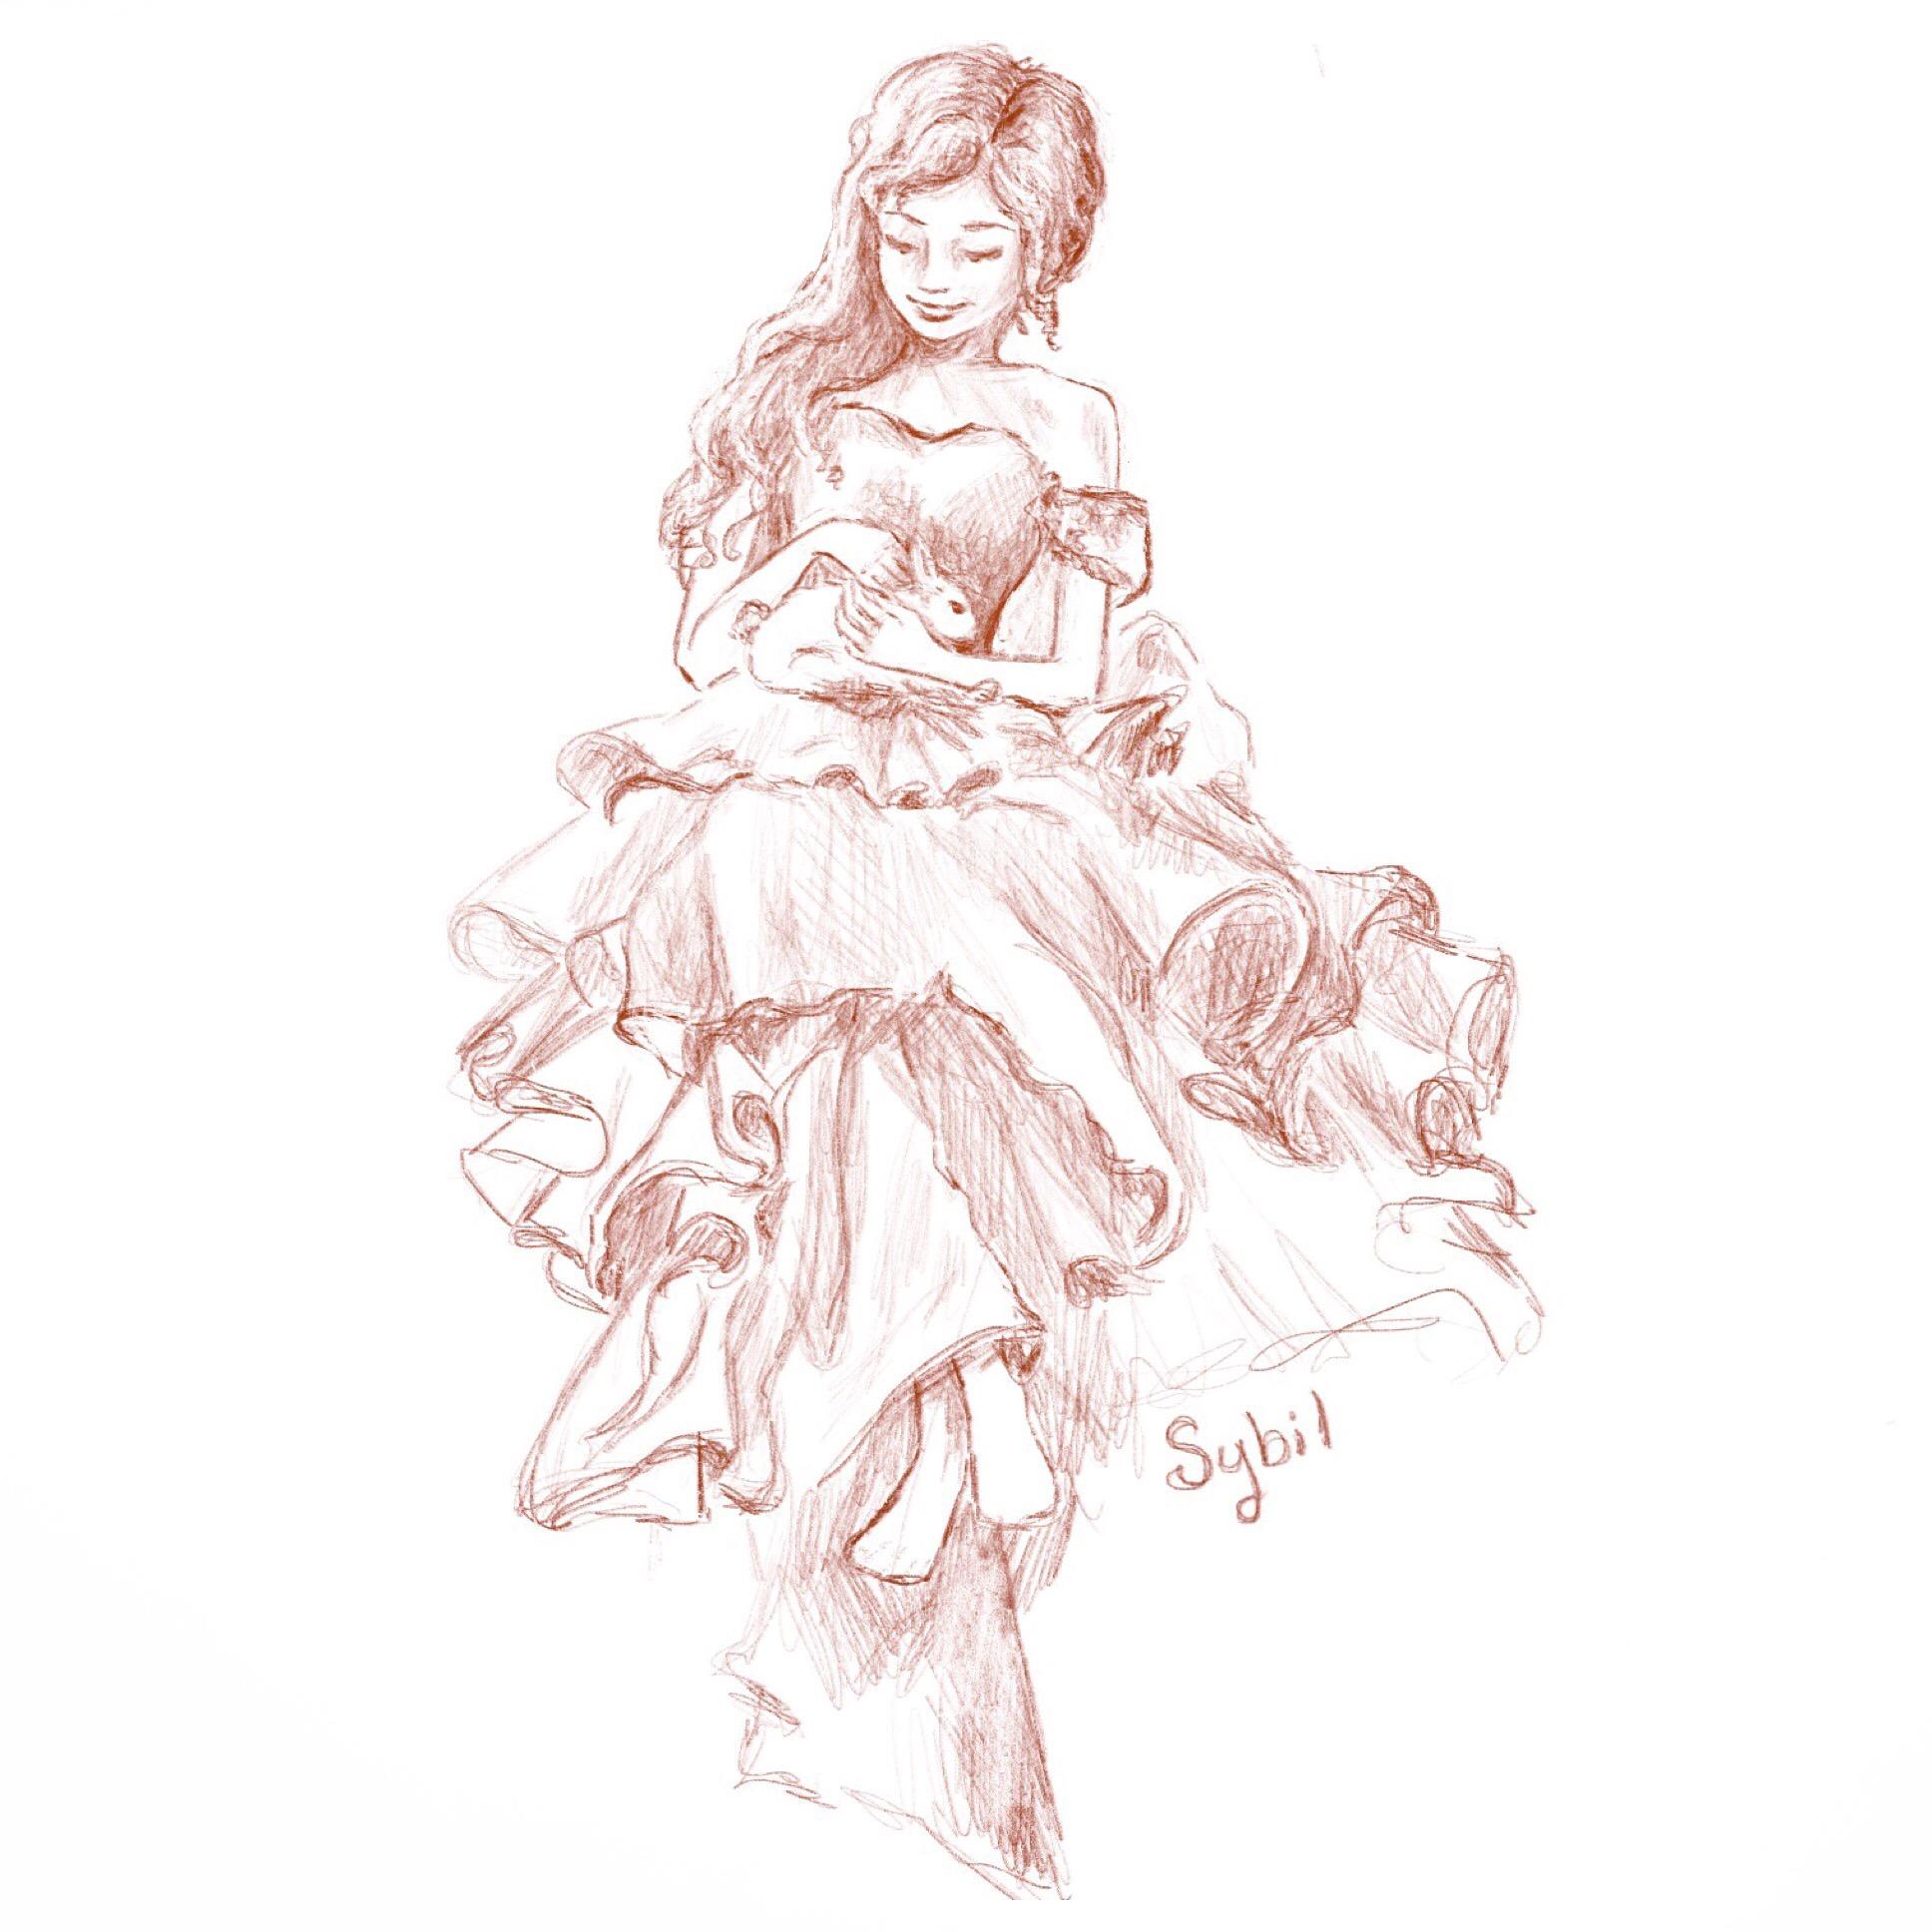 Sybil_S_Cohen_Sketch